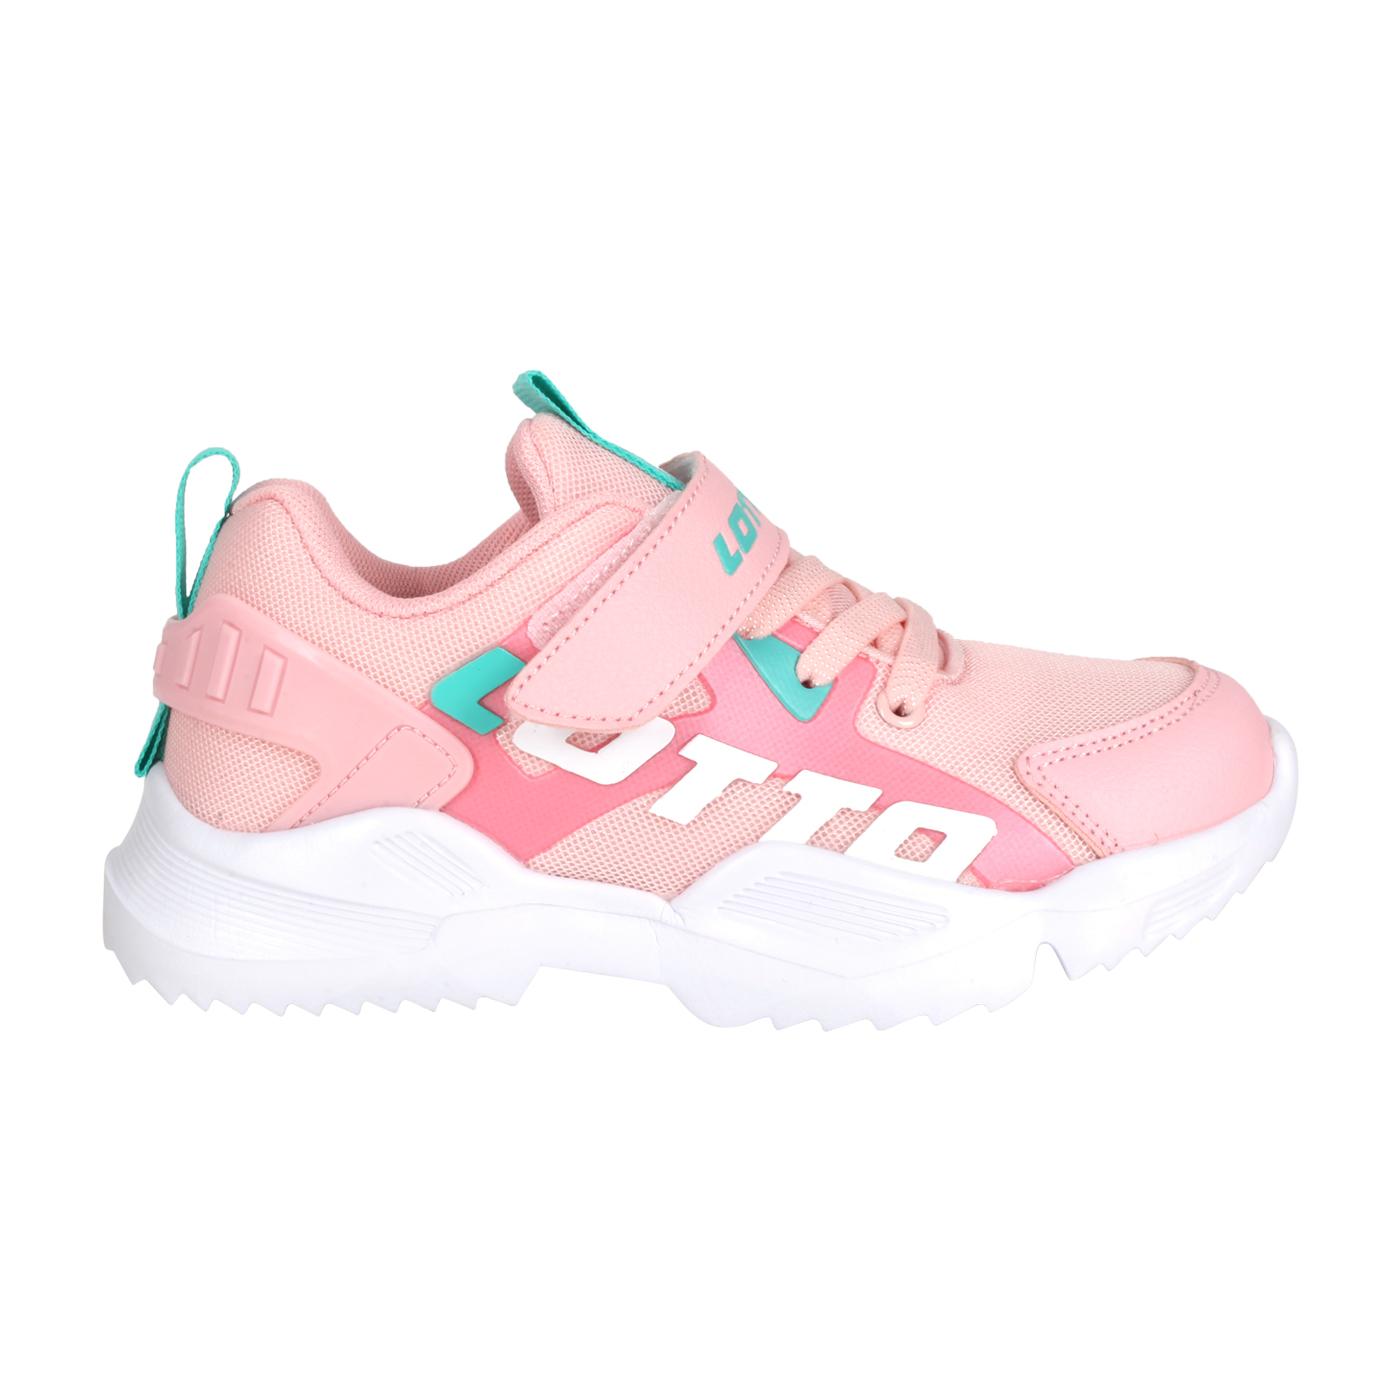 LOTTO 中童輕量跑鞋 LT0AKR1793 - 粉紅綠白